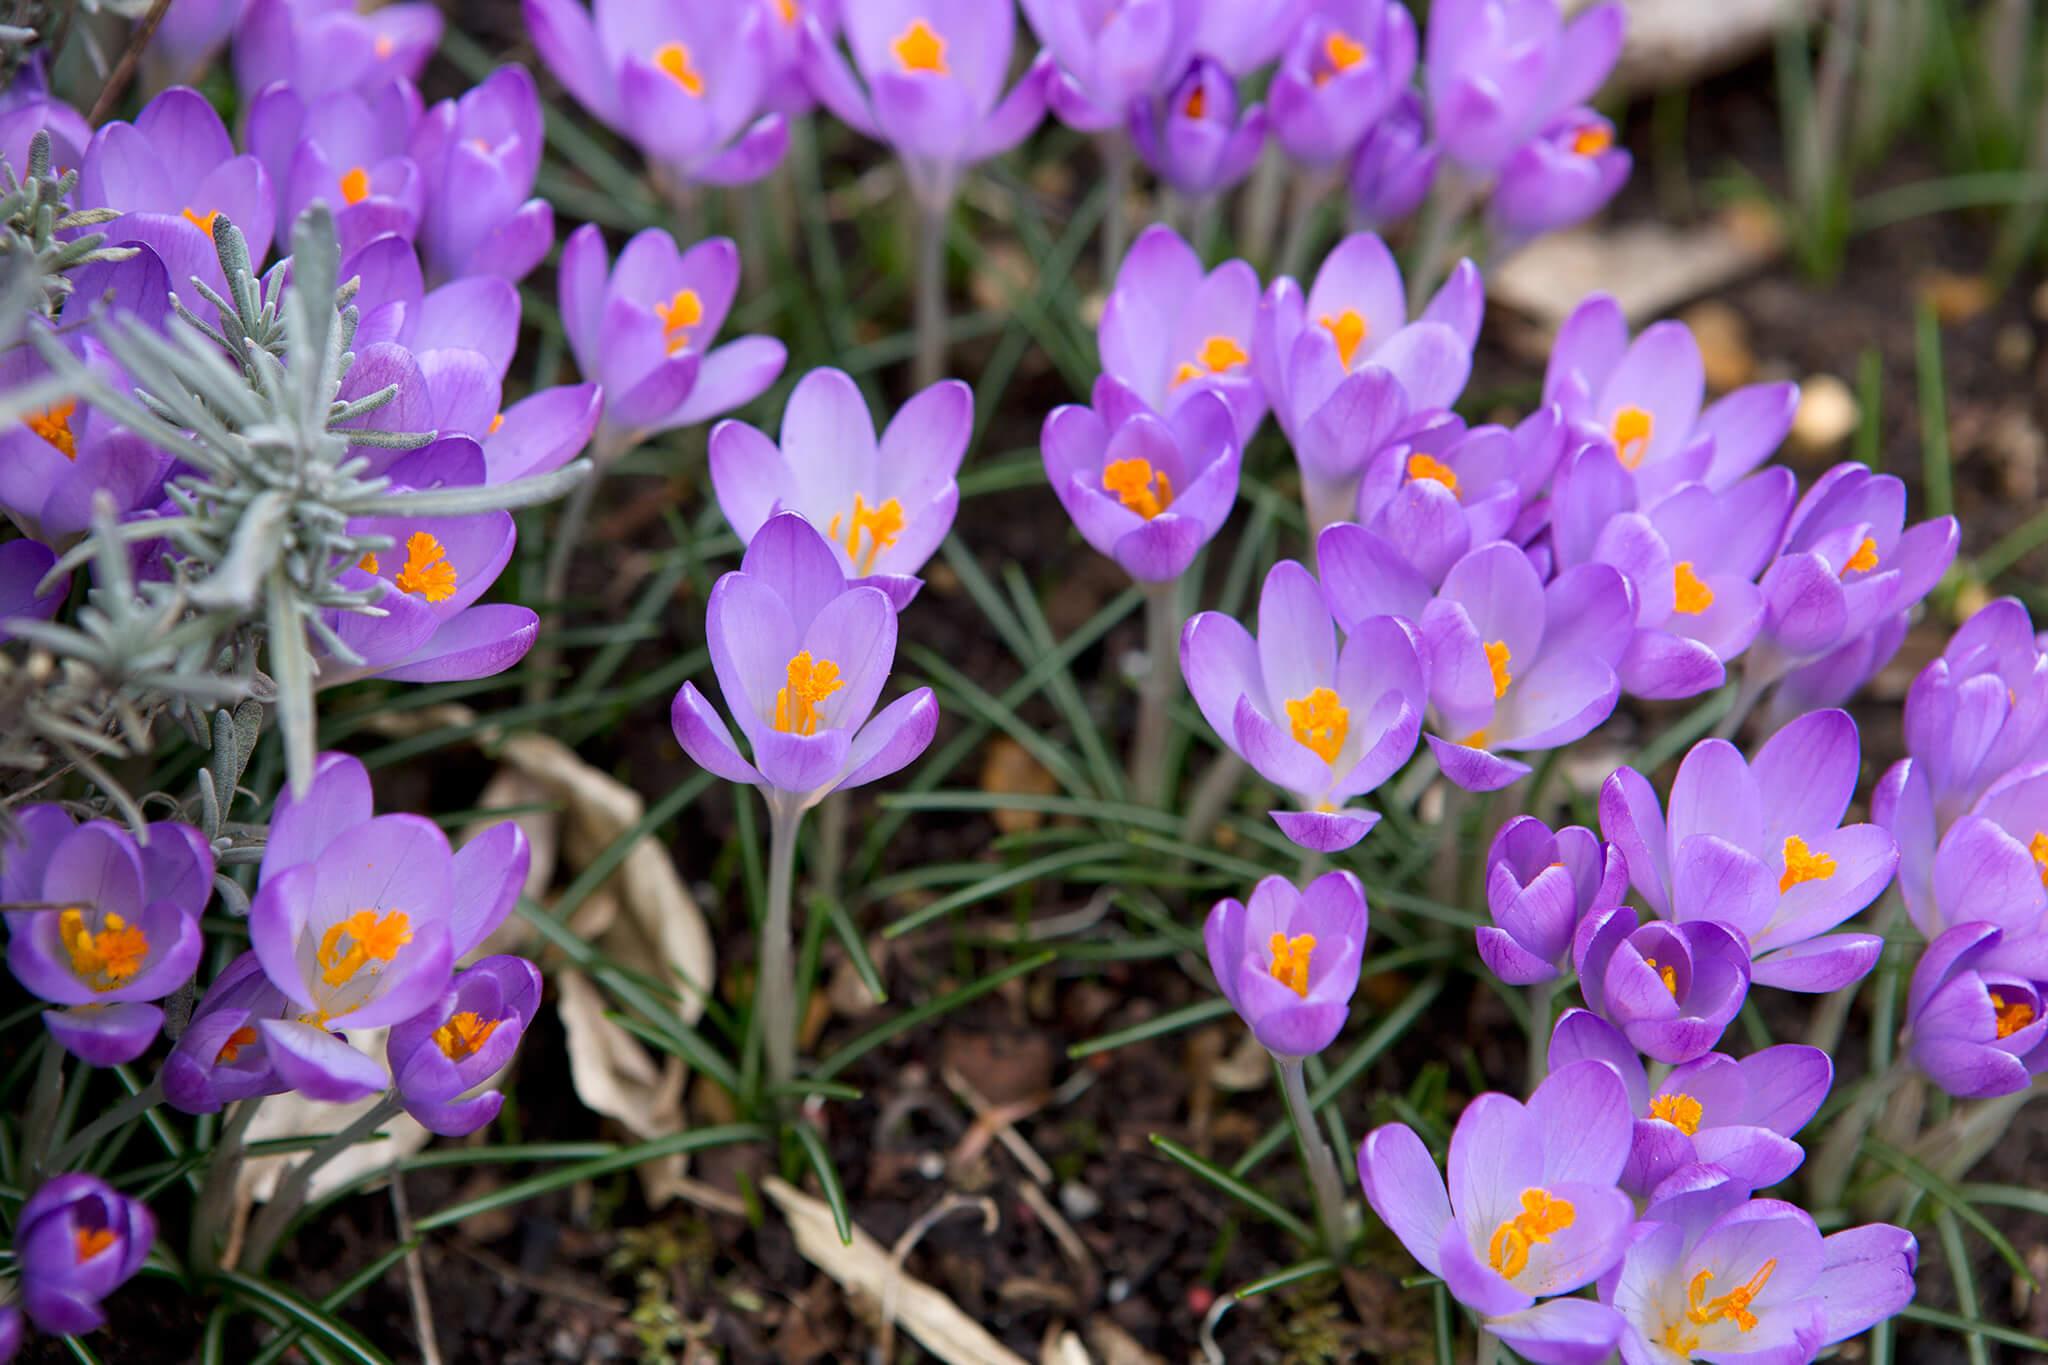 crocus-flowers-2